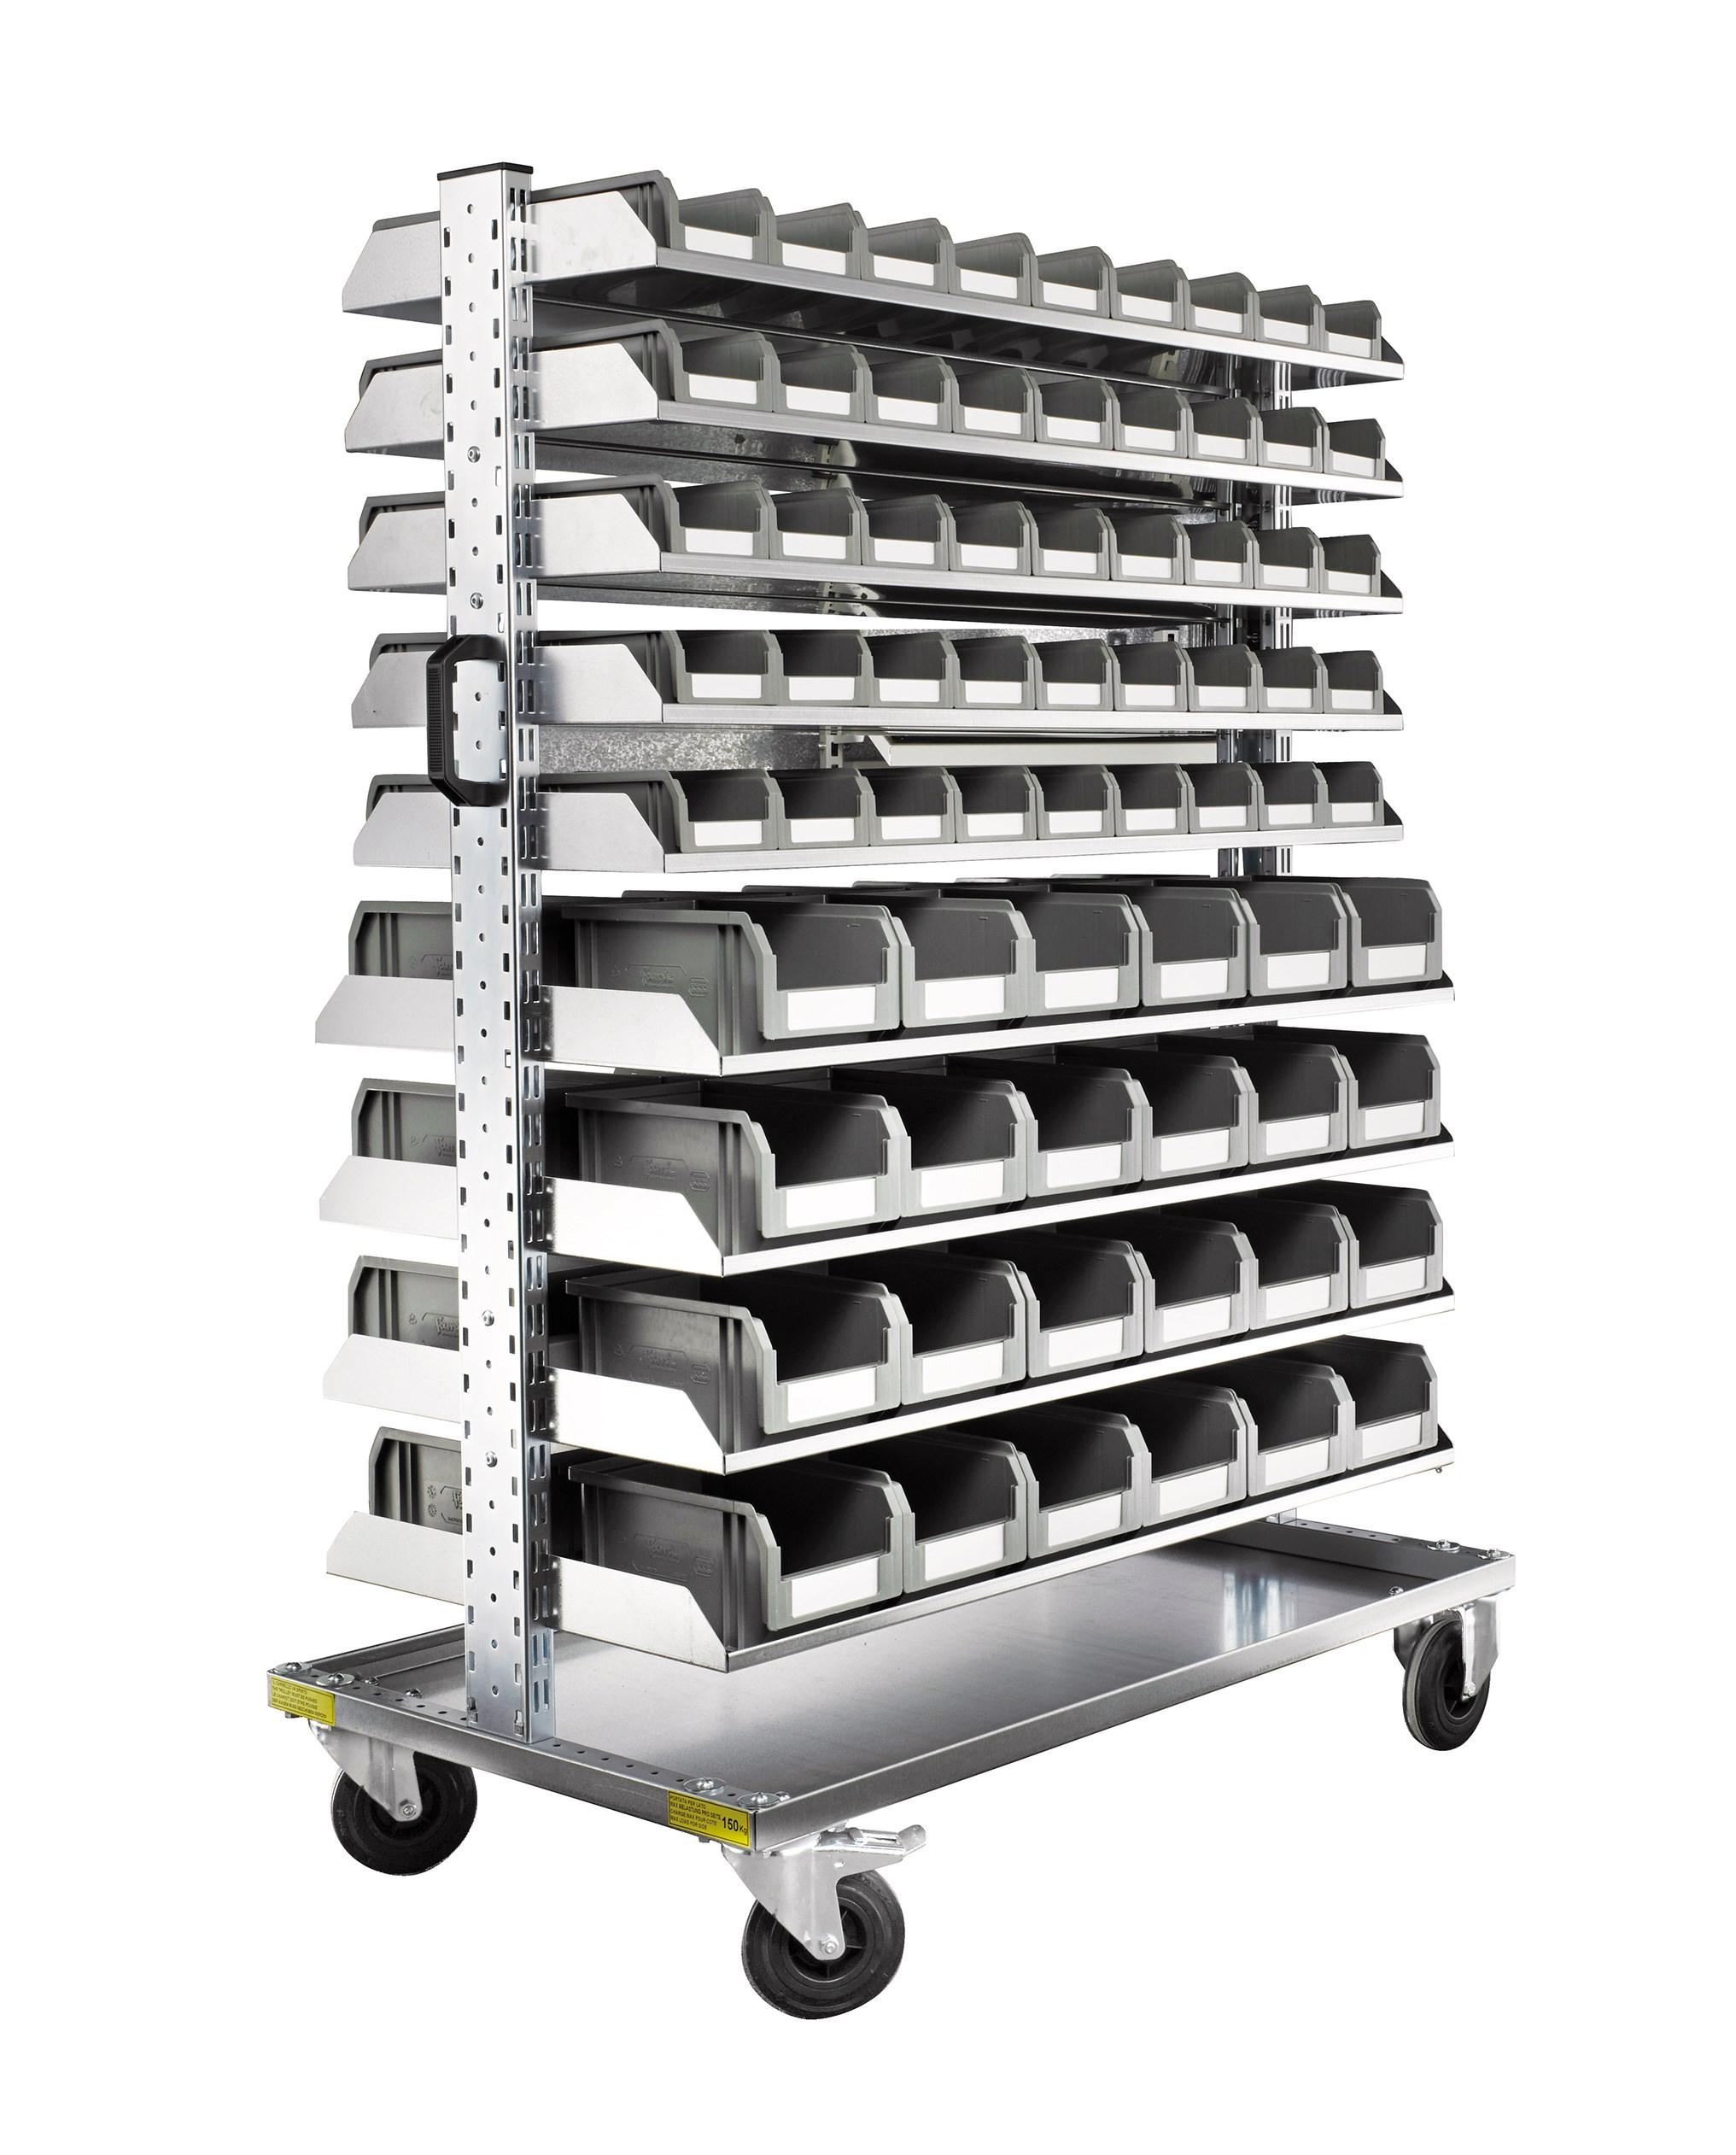 Chariot mobile avec rack 138 bacs à bec plastiques